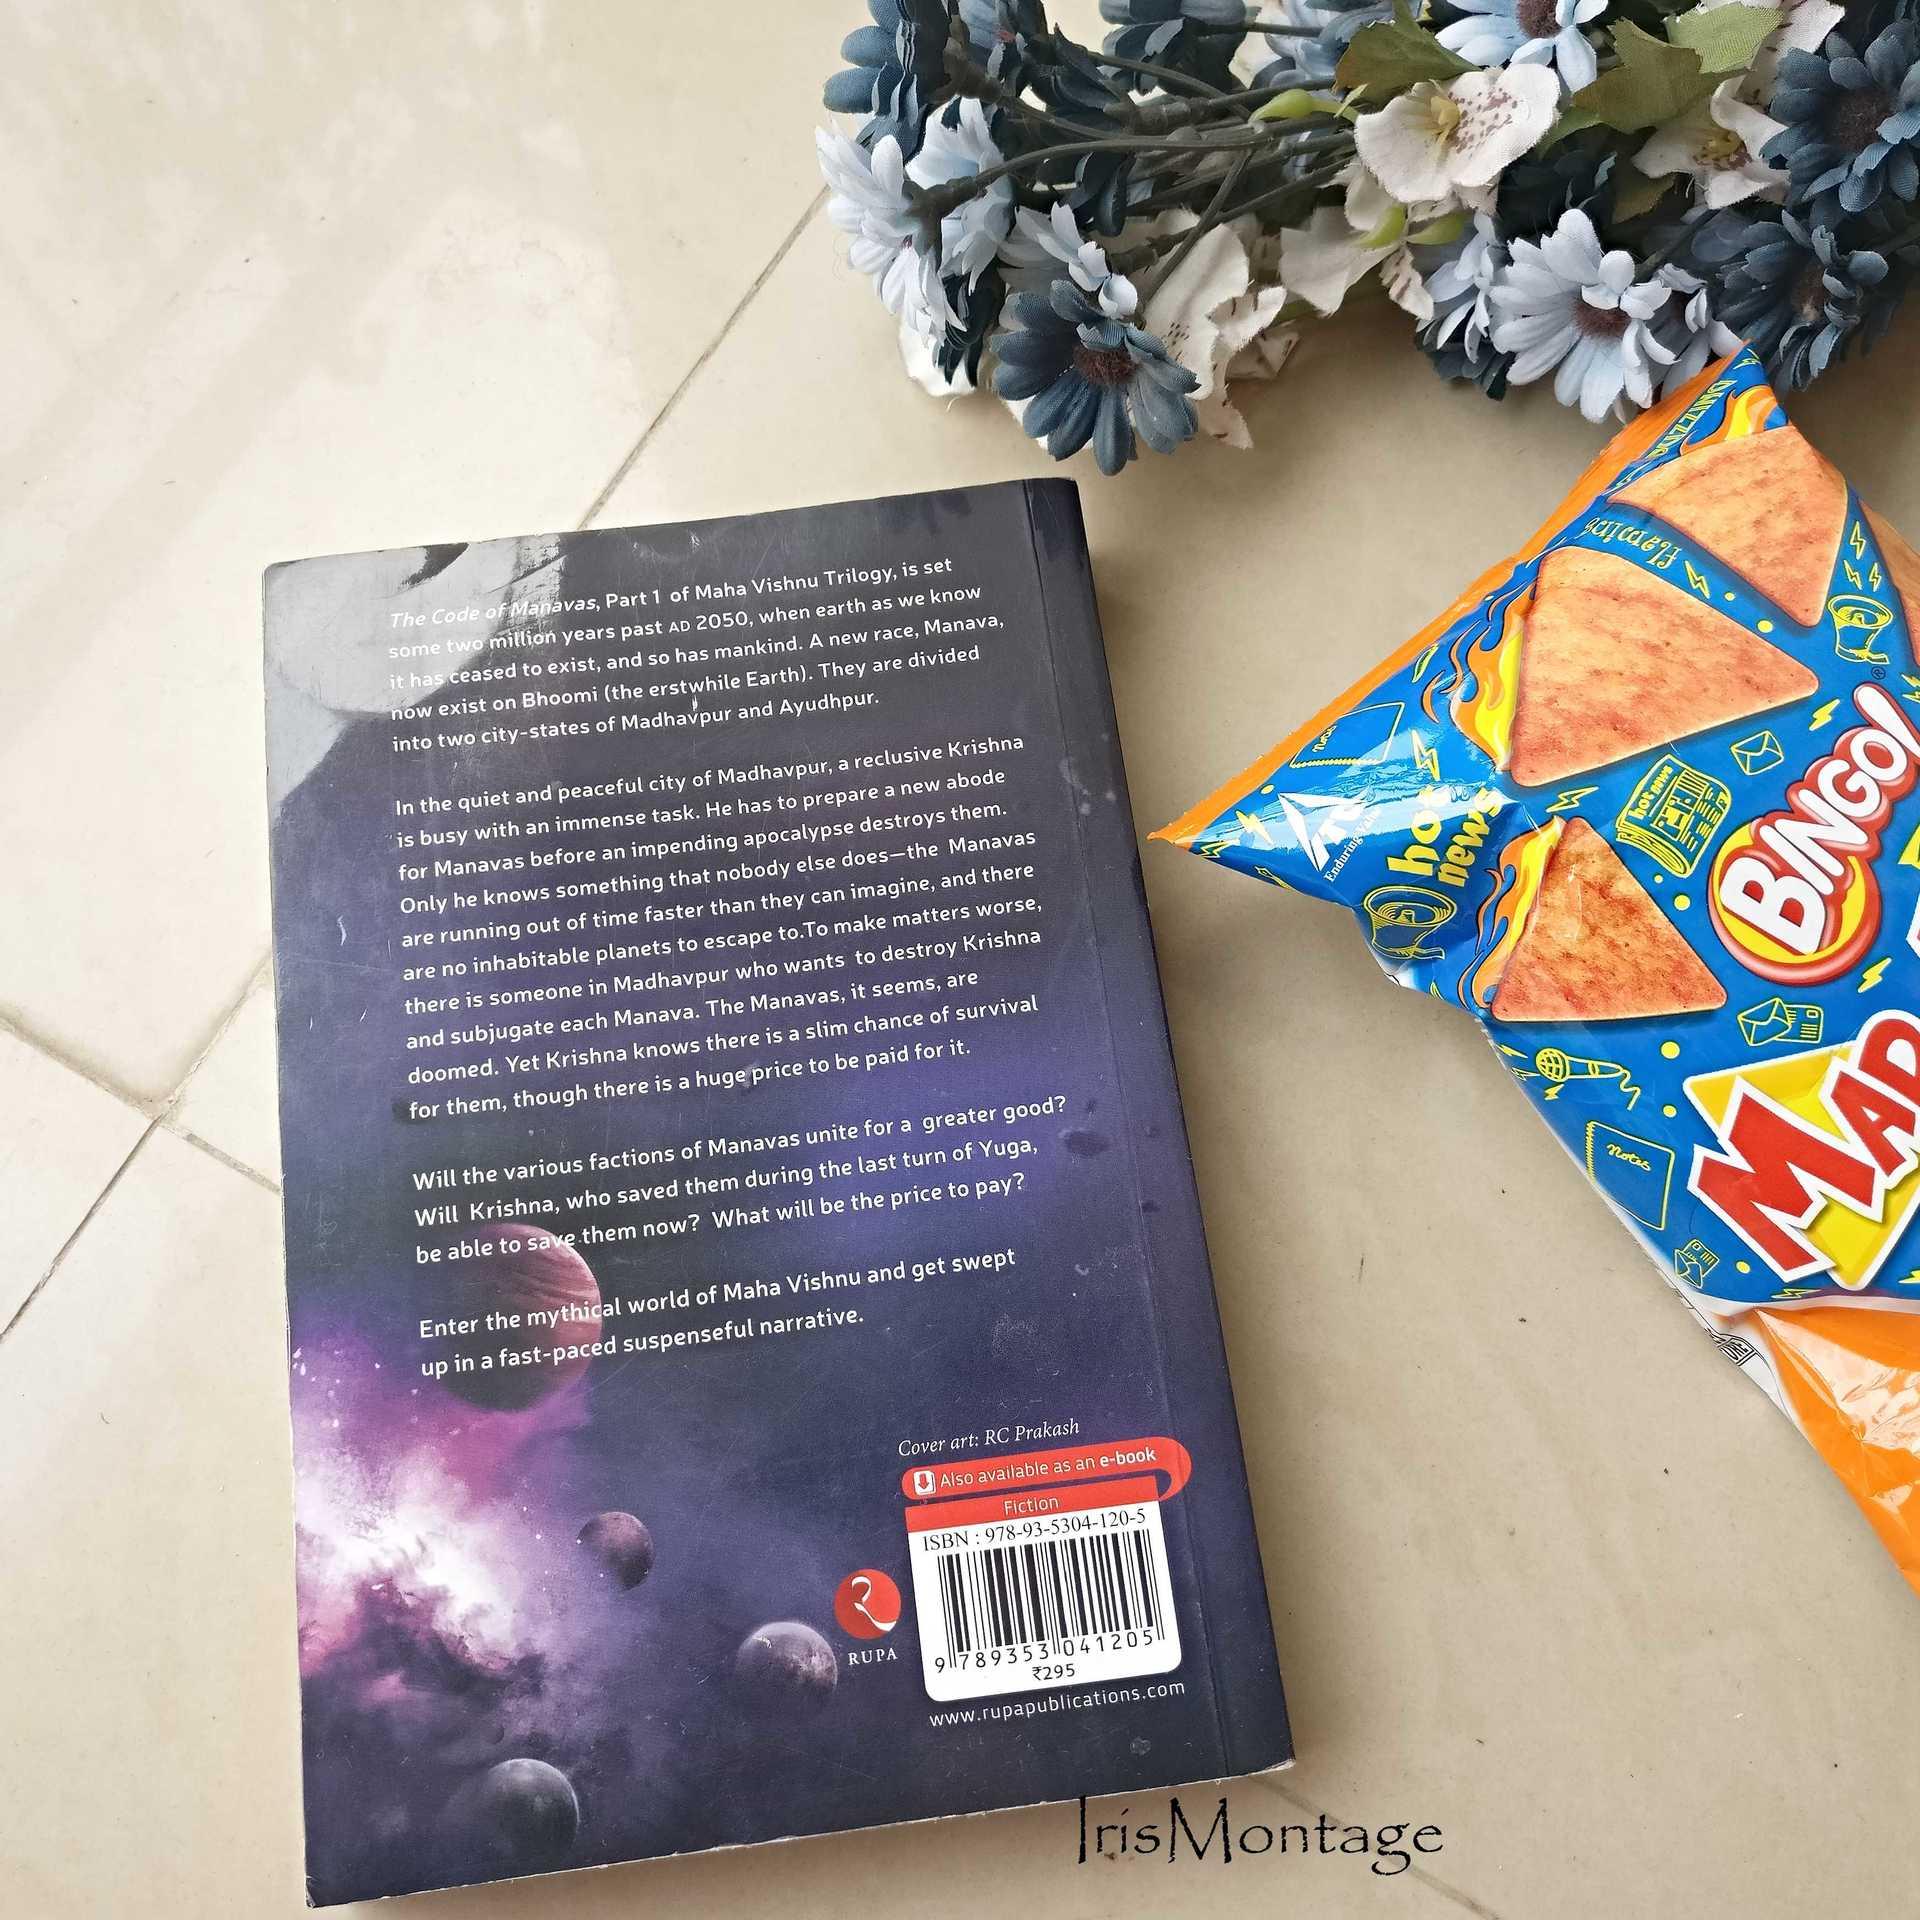 IrisMontage - The Code of Manavas_review Arpit Bakshi